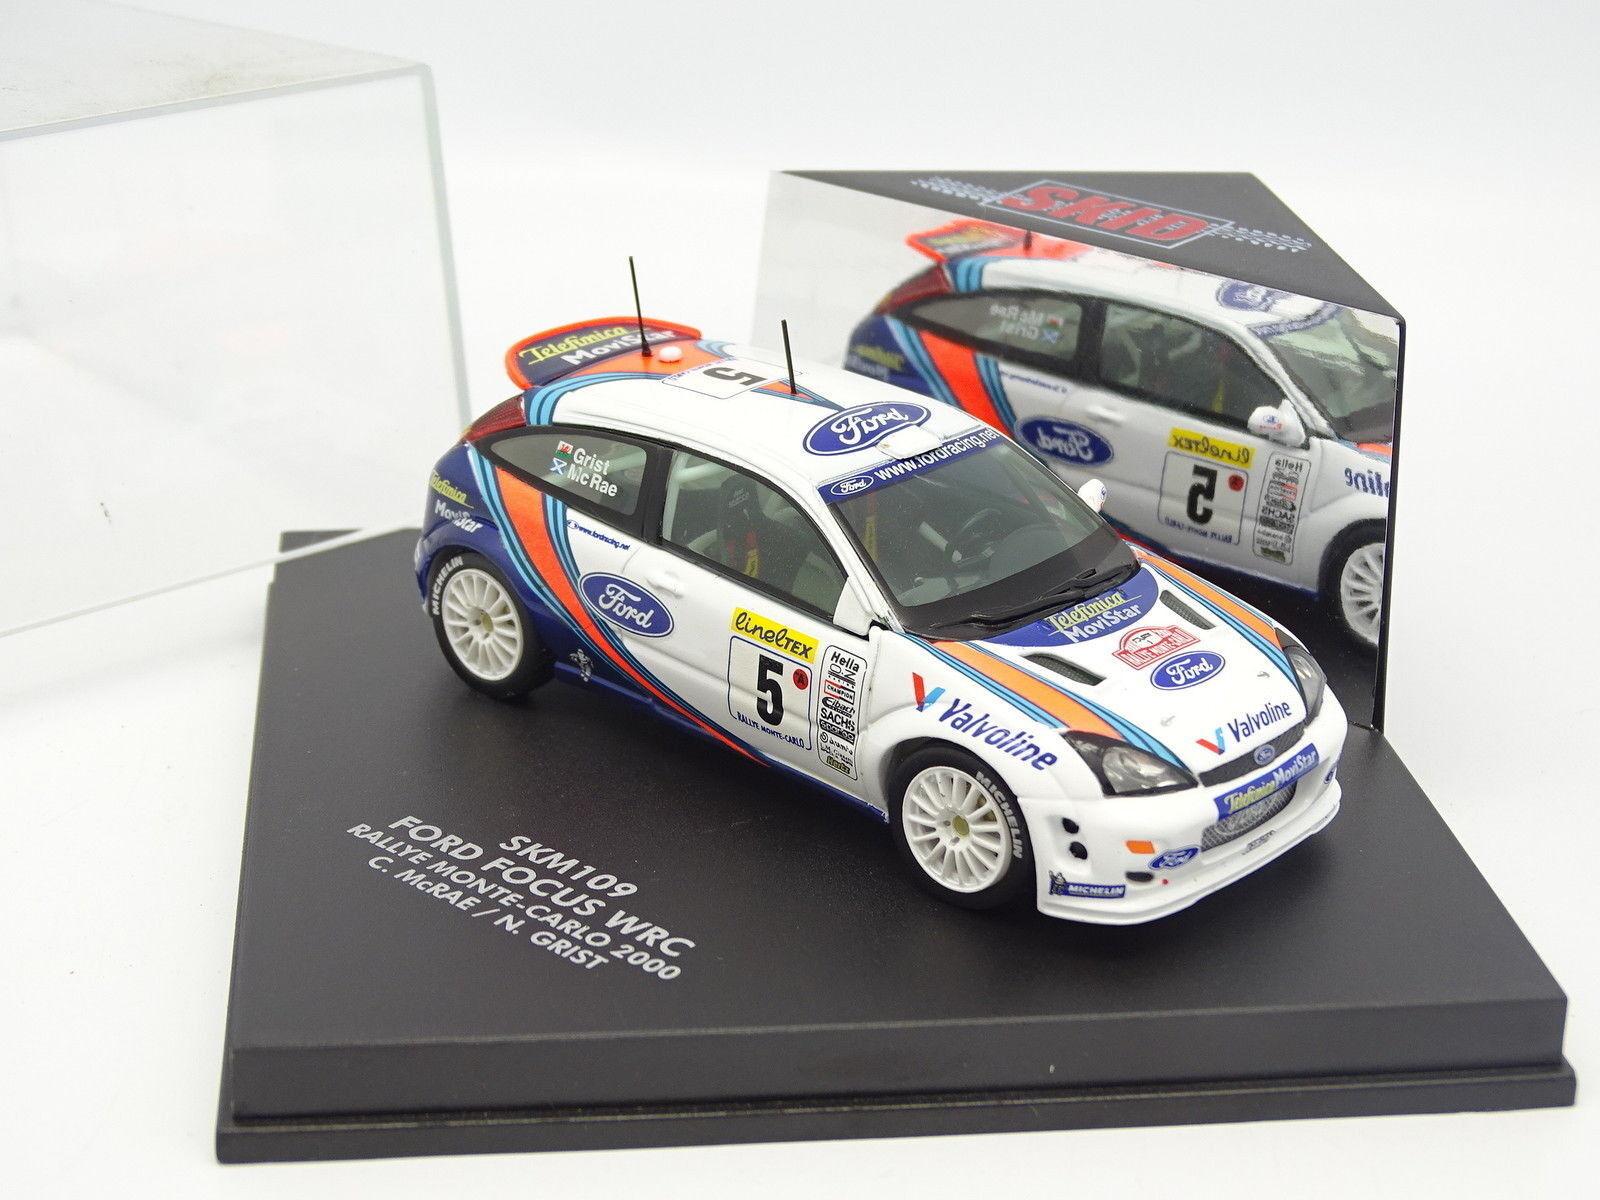 Speed Skid 1 43 43 43 - Ford Focus WRC Rally Mounted Carlo 2000 McRae 9898b4